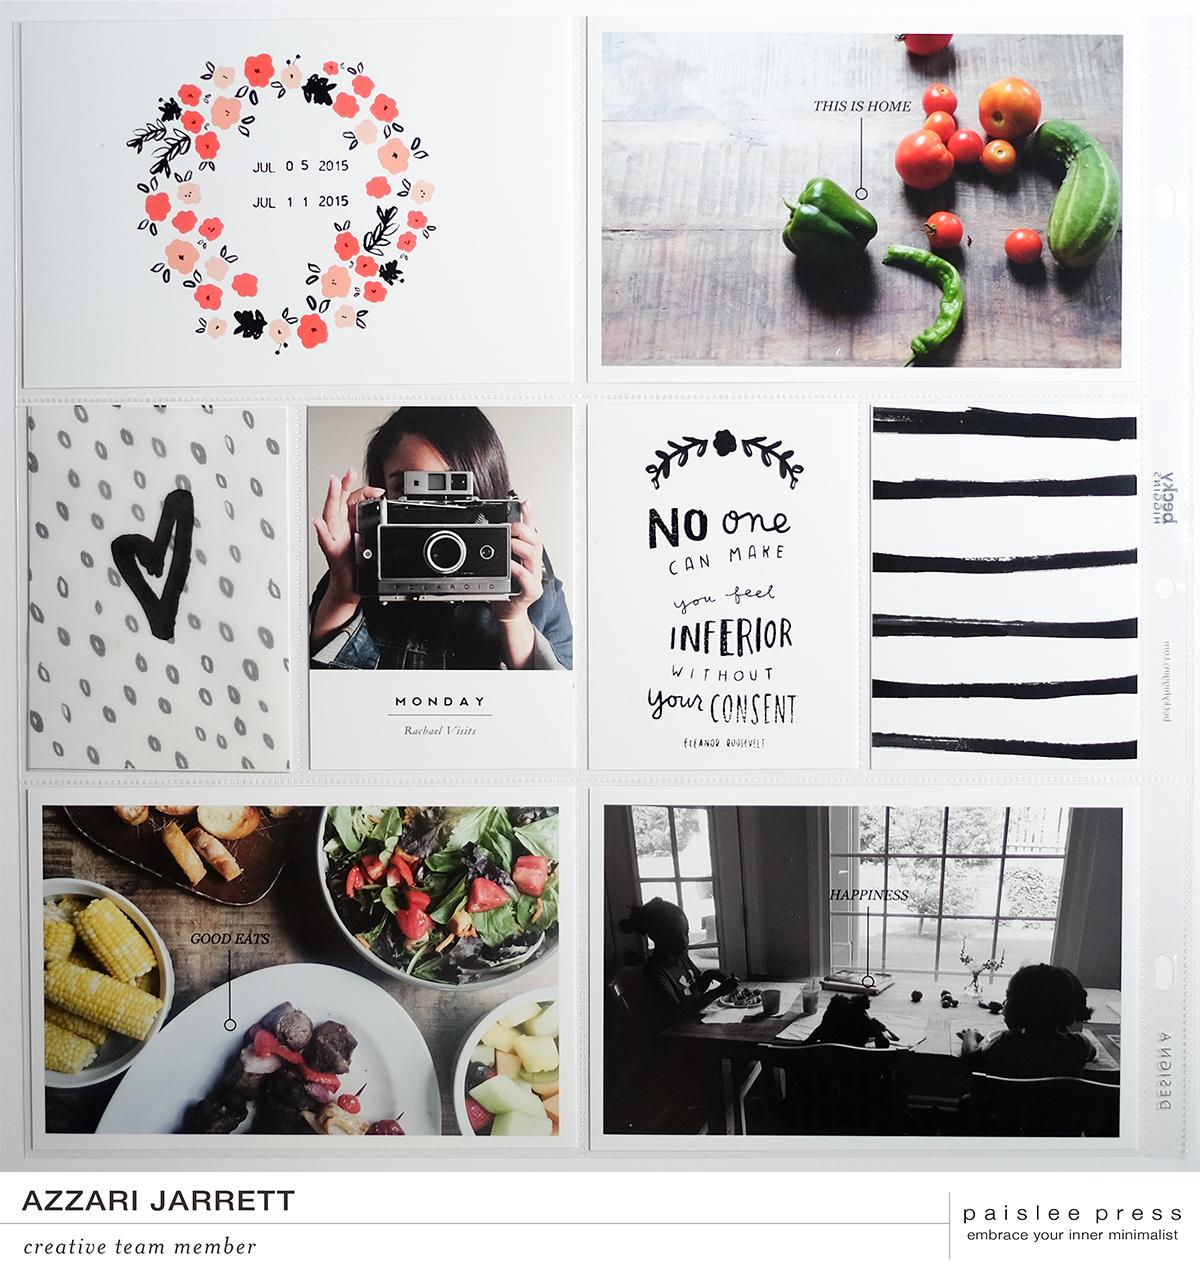 paislee-AugustProject-projectbyazzarijarrett_blog.jpg